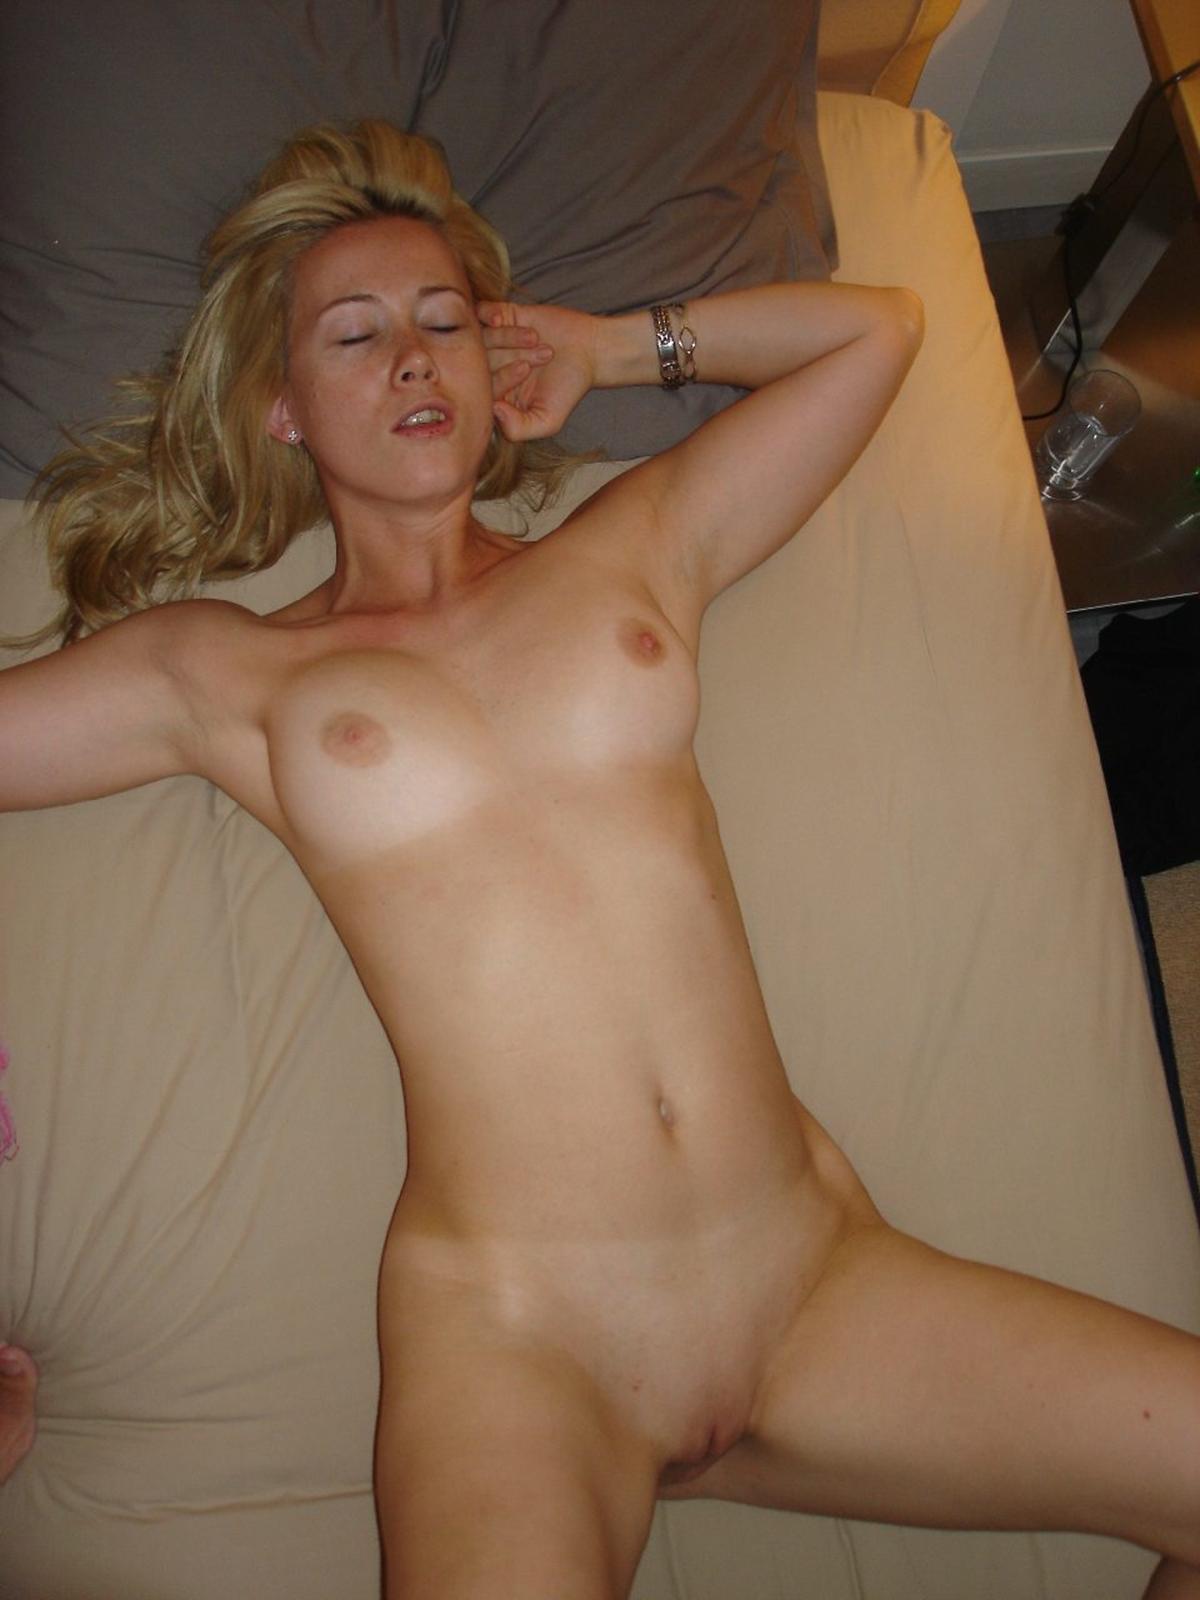 Porn thumbnails cute nude slut